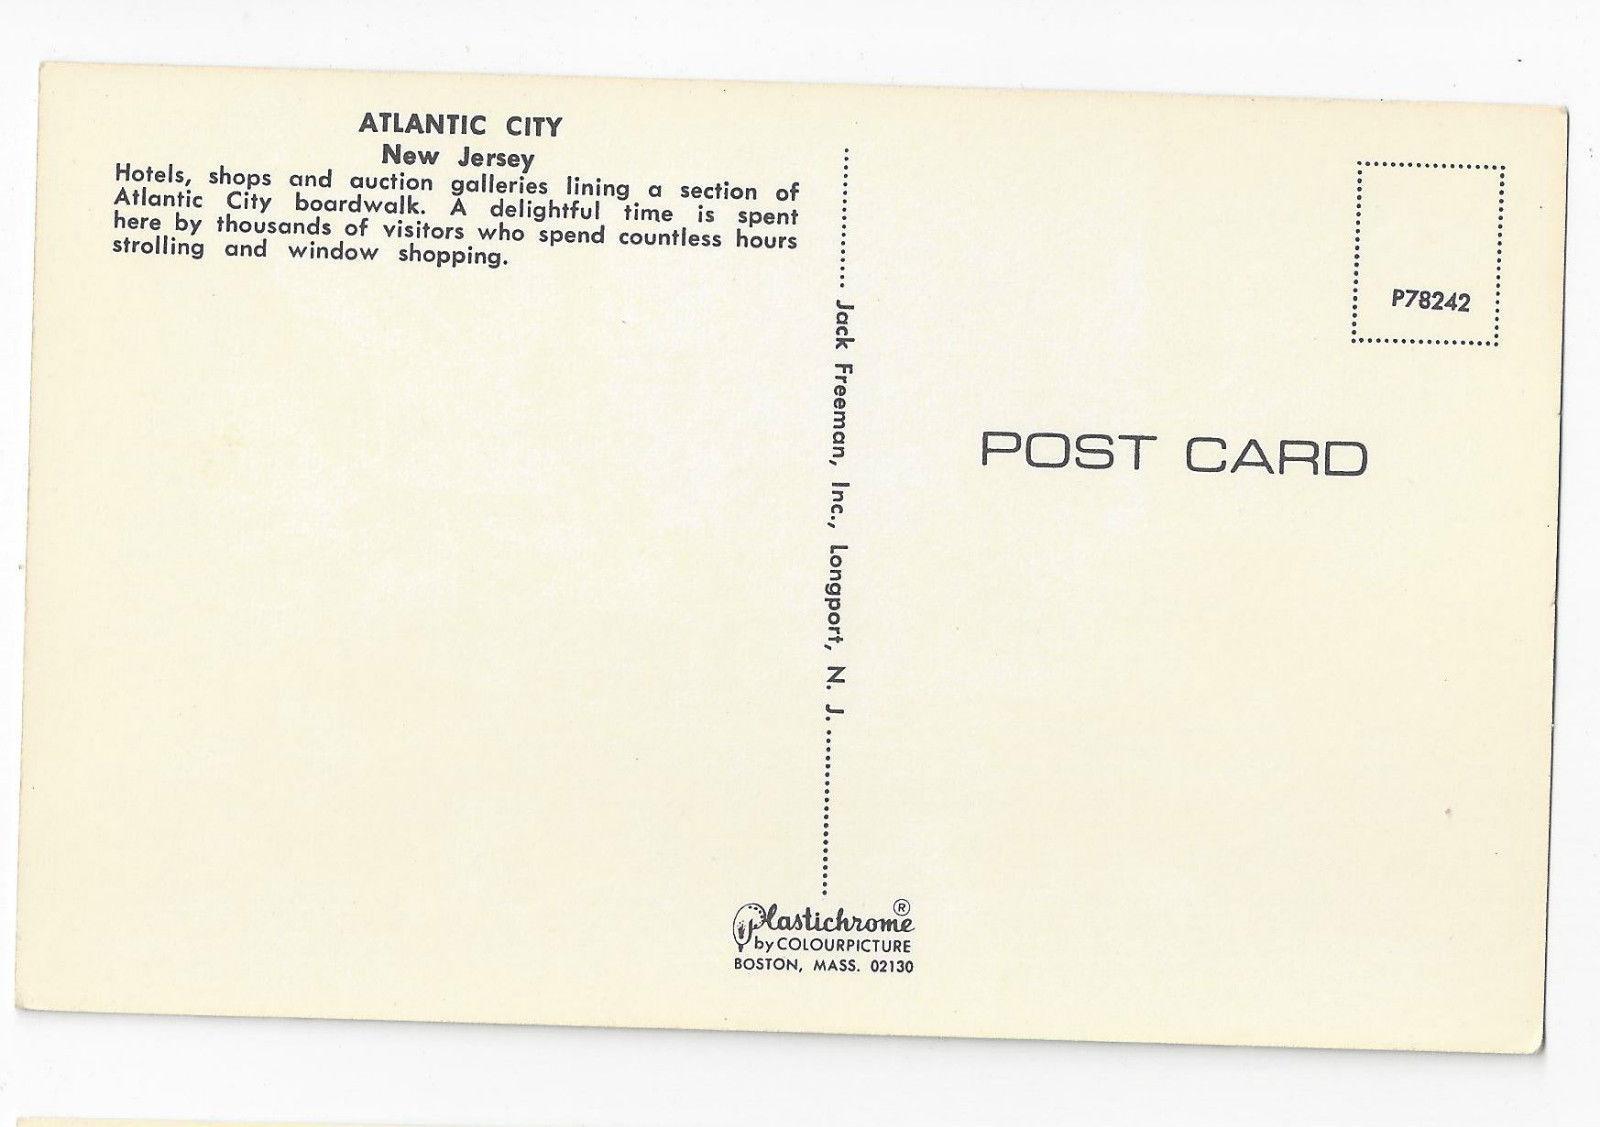 Atlantic City NJ Boardwalk Hotels Marlborough Shops Vintage Freeman Postcard